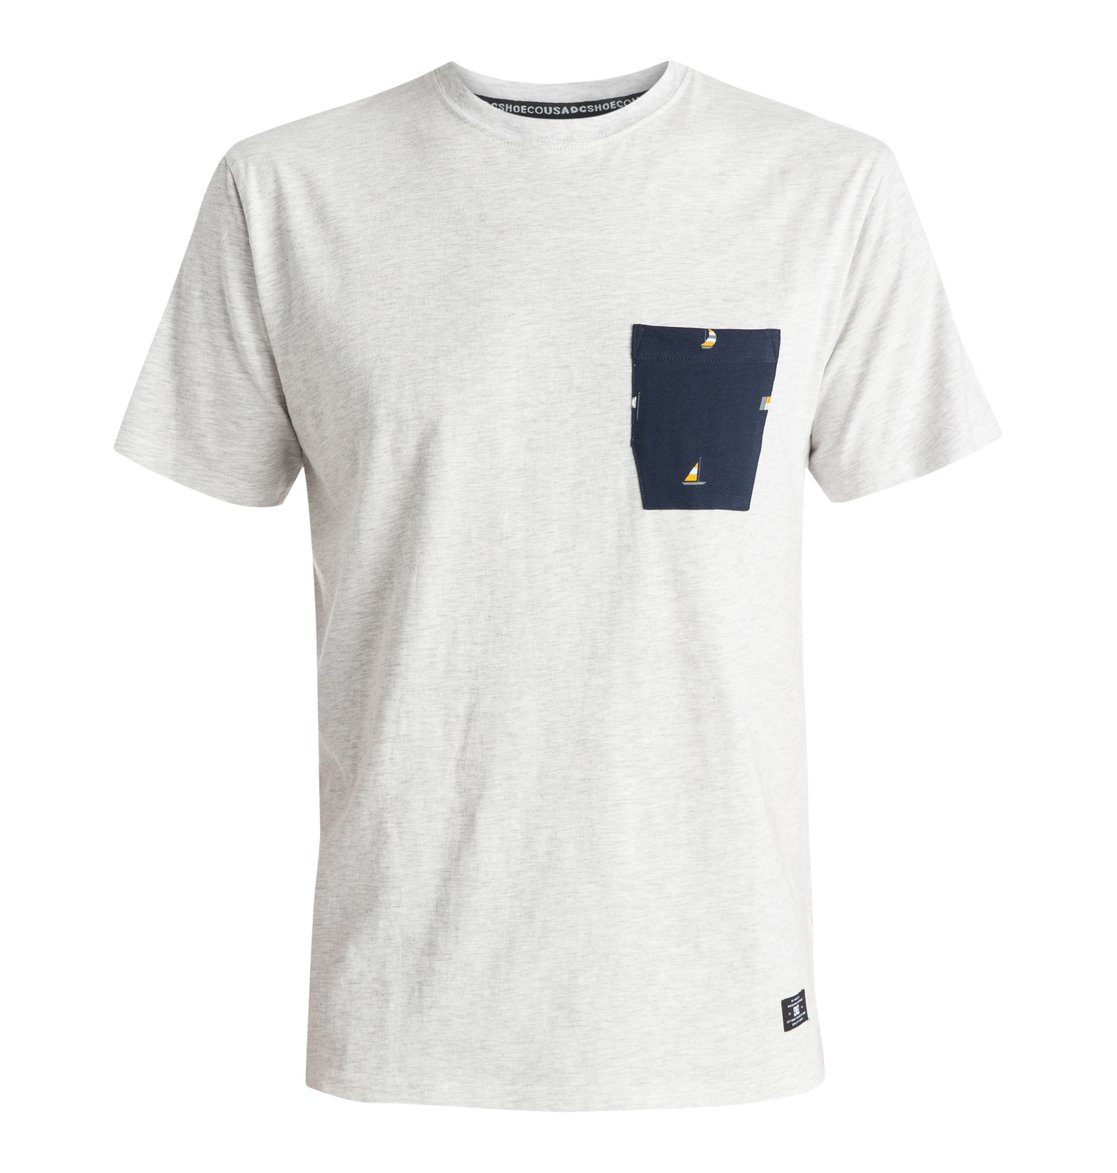 Woodglen T-Shirt